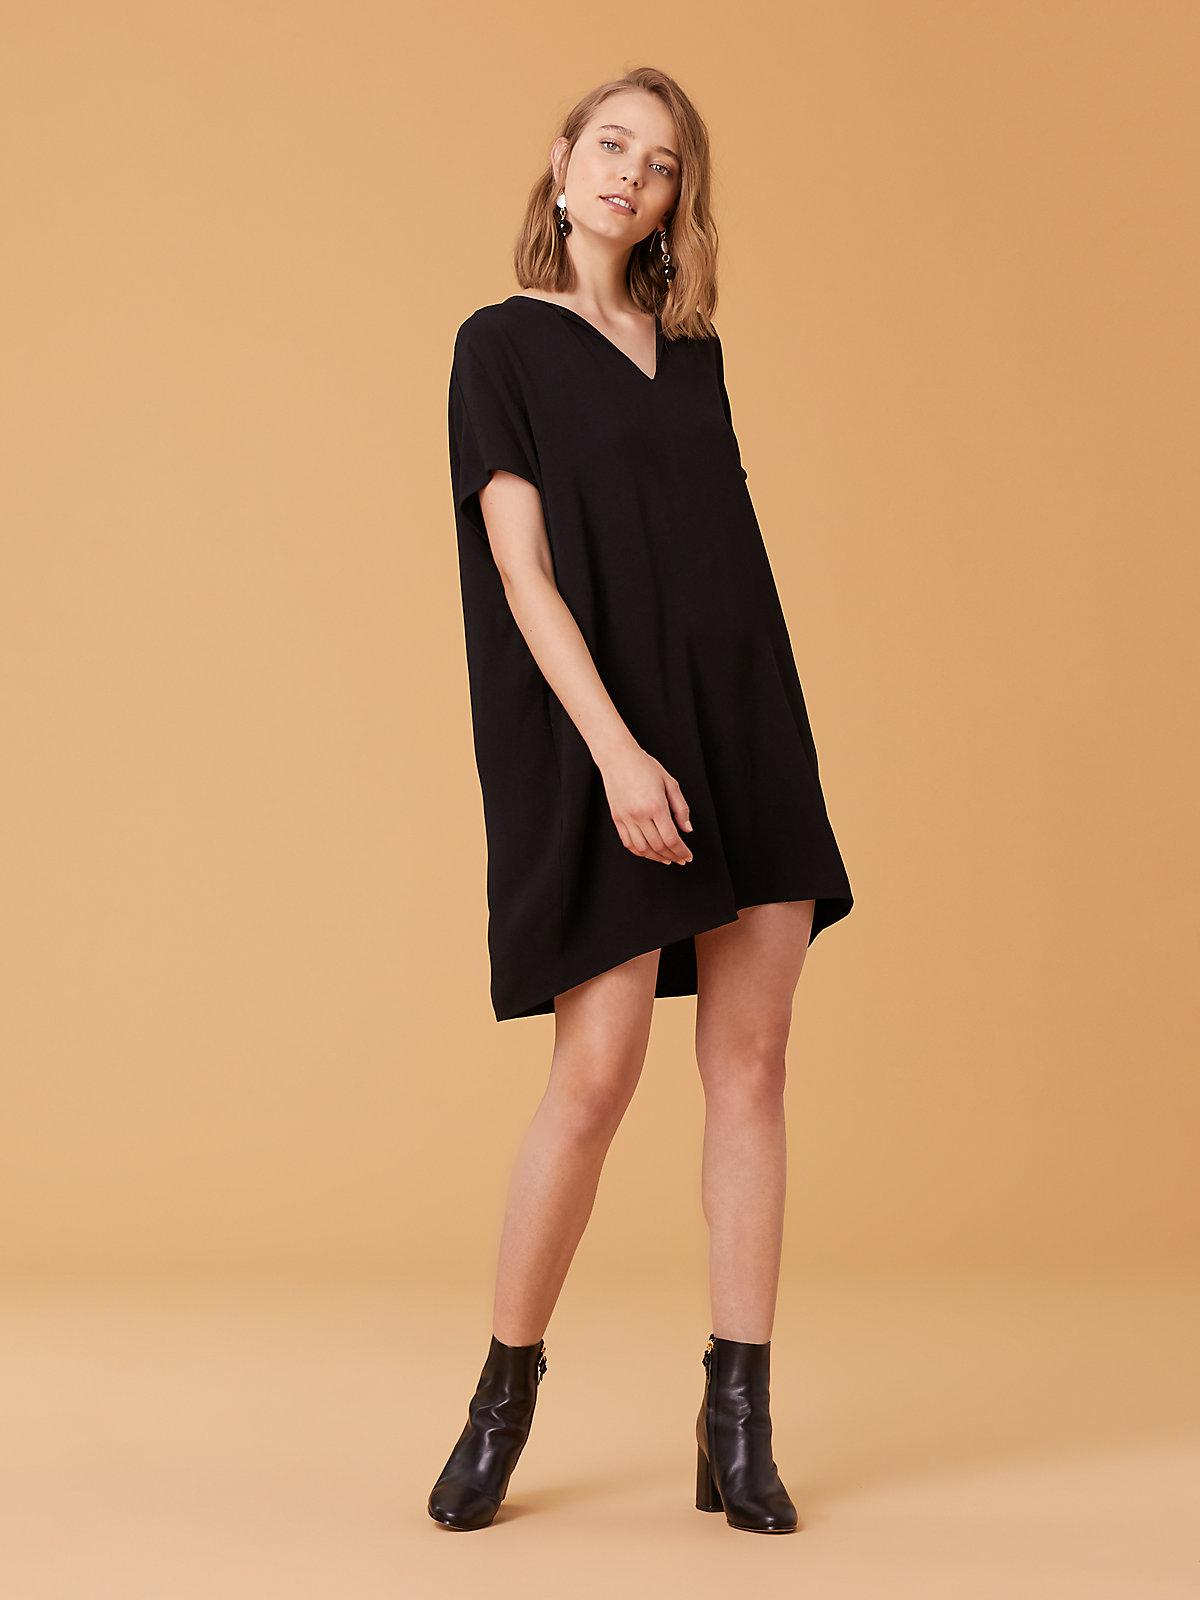 4fb5e7e0b52 Diane von Furstenberg The Dvf Kora Dress in Black - Lyst